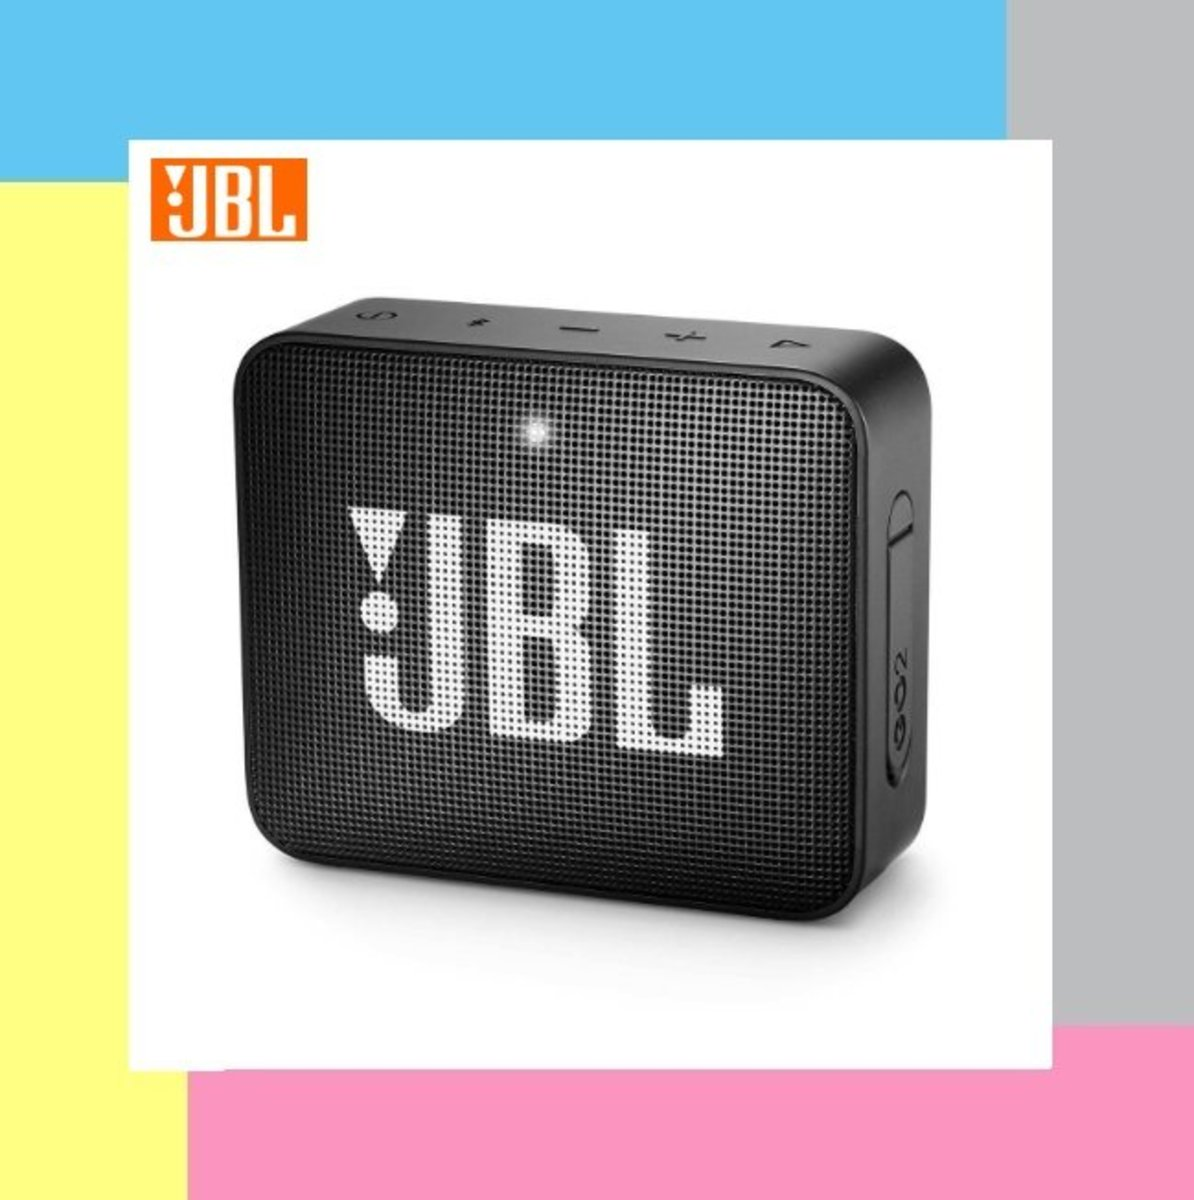 JBL GO 2 Wireless Speaker - Midnight Black [Parallel Import]